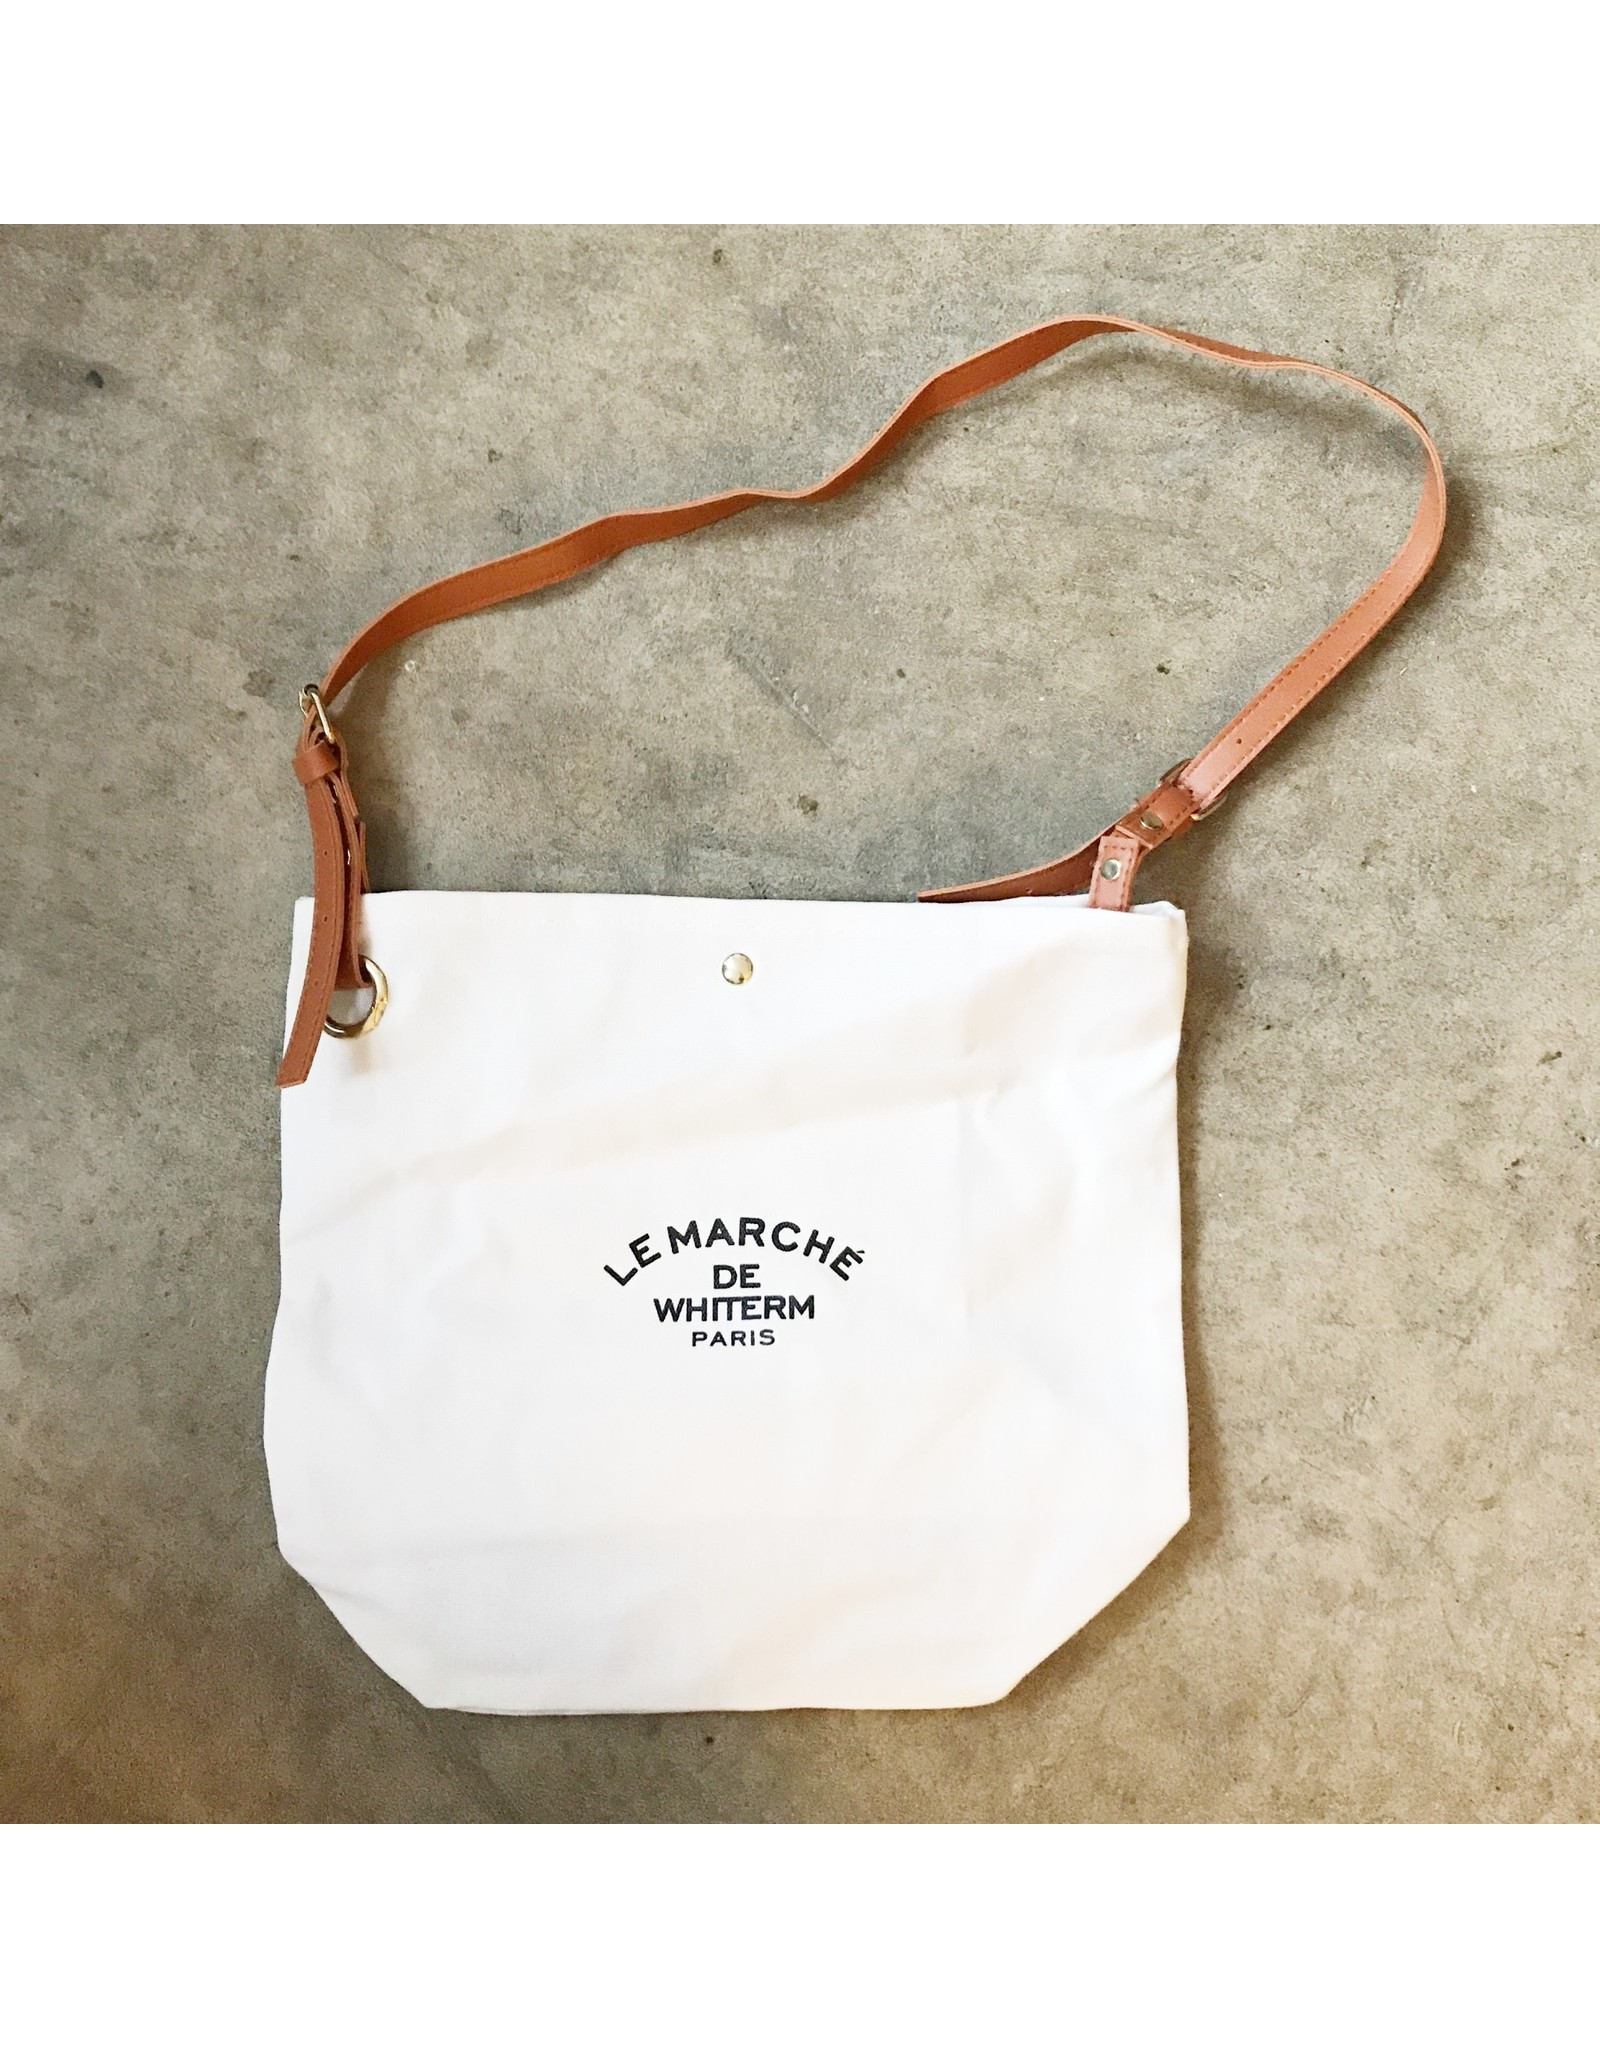 Young & Heart Le Marche Canvas Shoulder Bag with Adjustable Strap and Inside Pocket